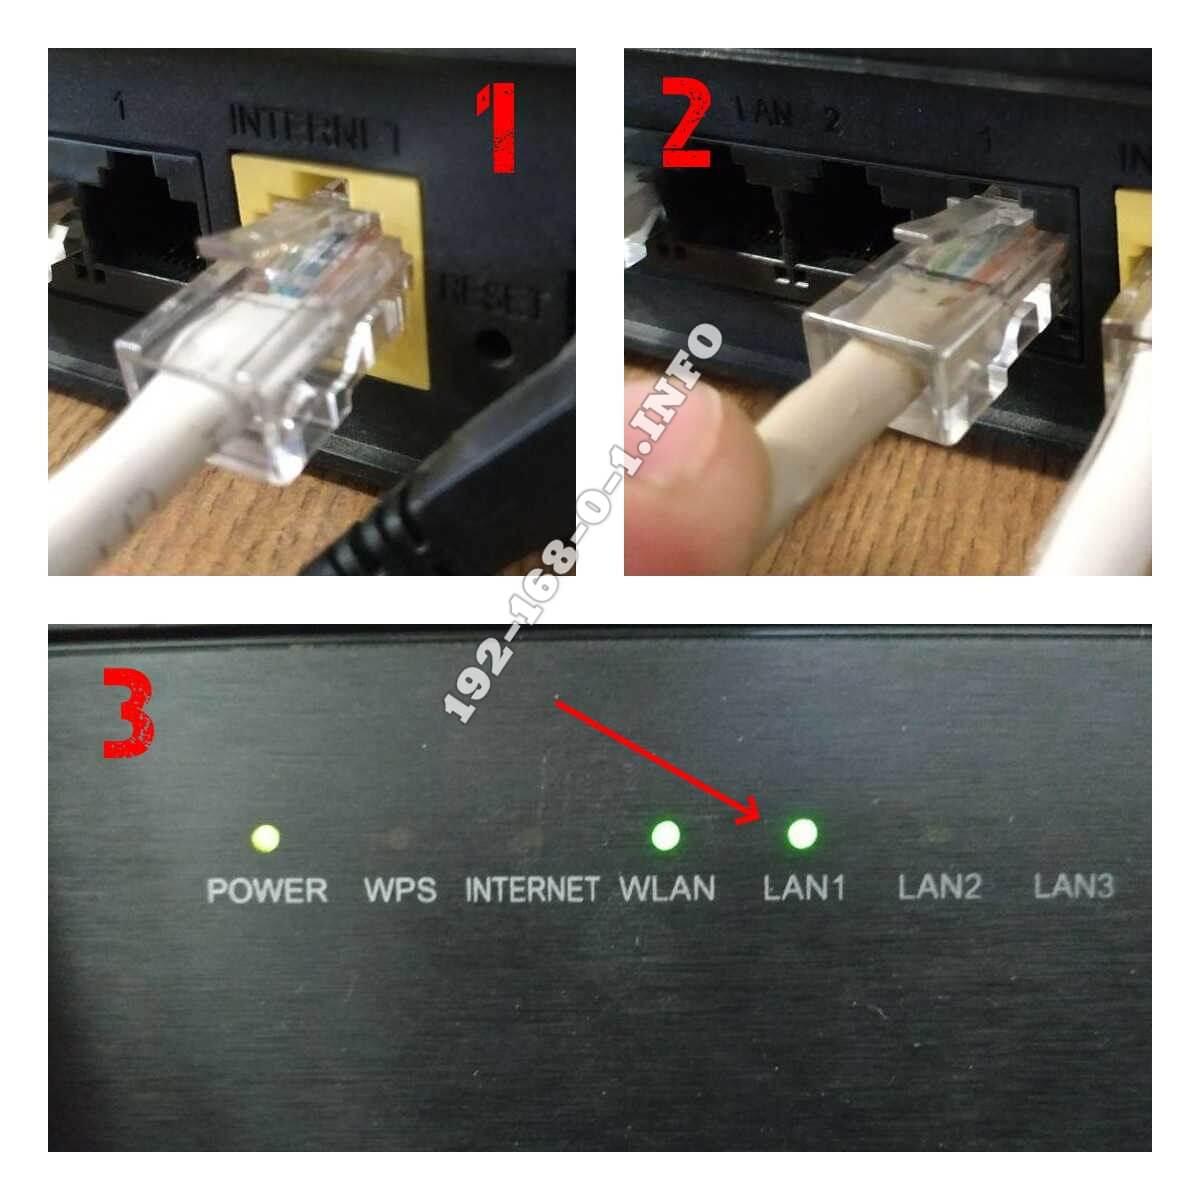 как подключиться к wi-fi маршрутизатору